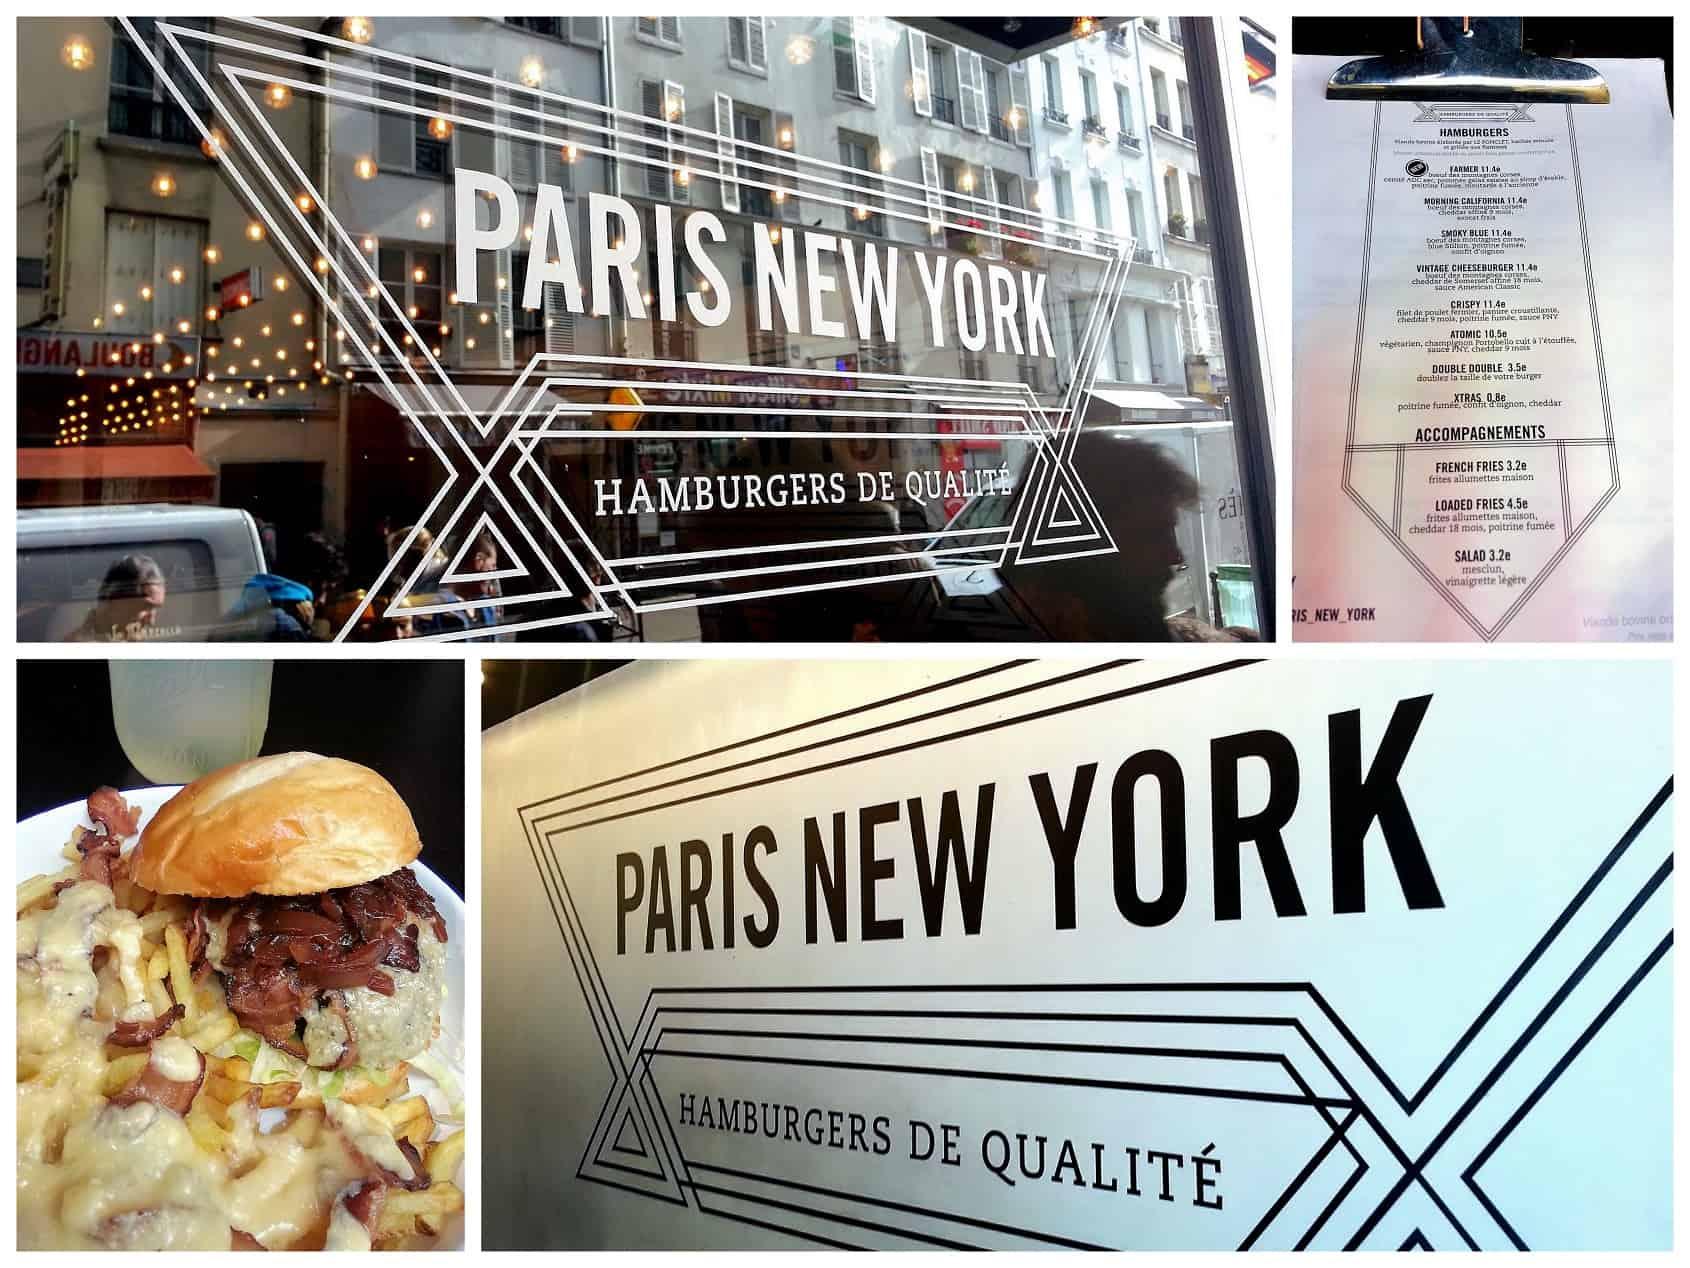 Paris New York